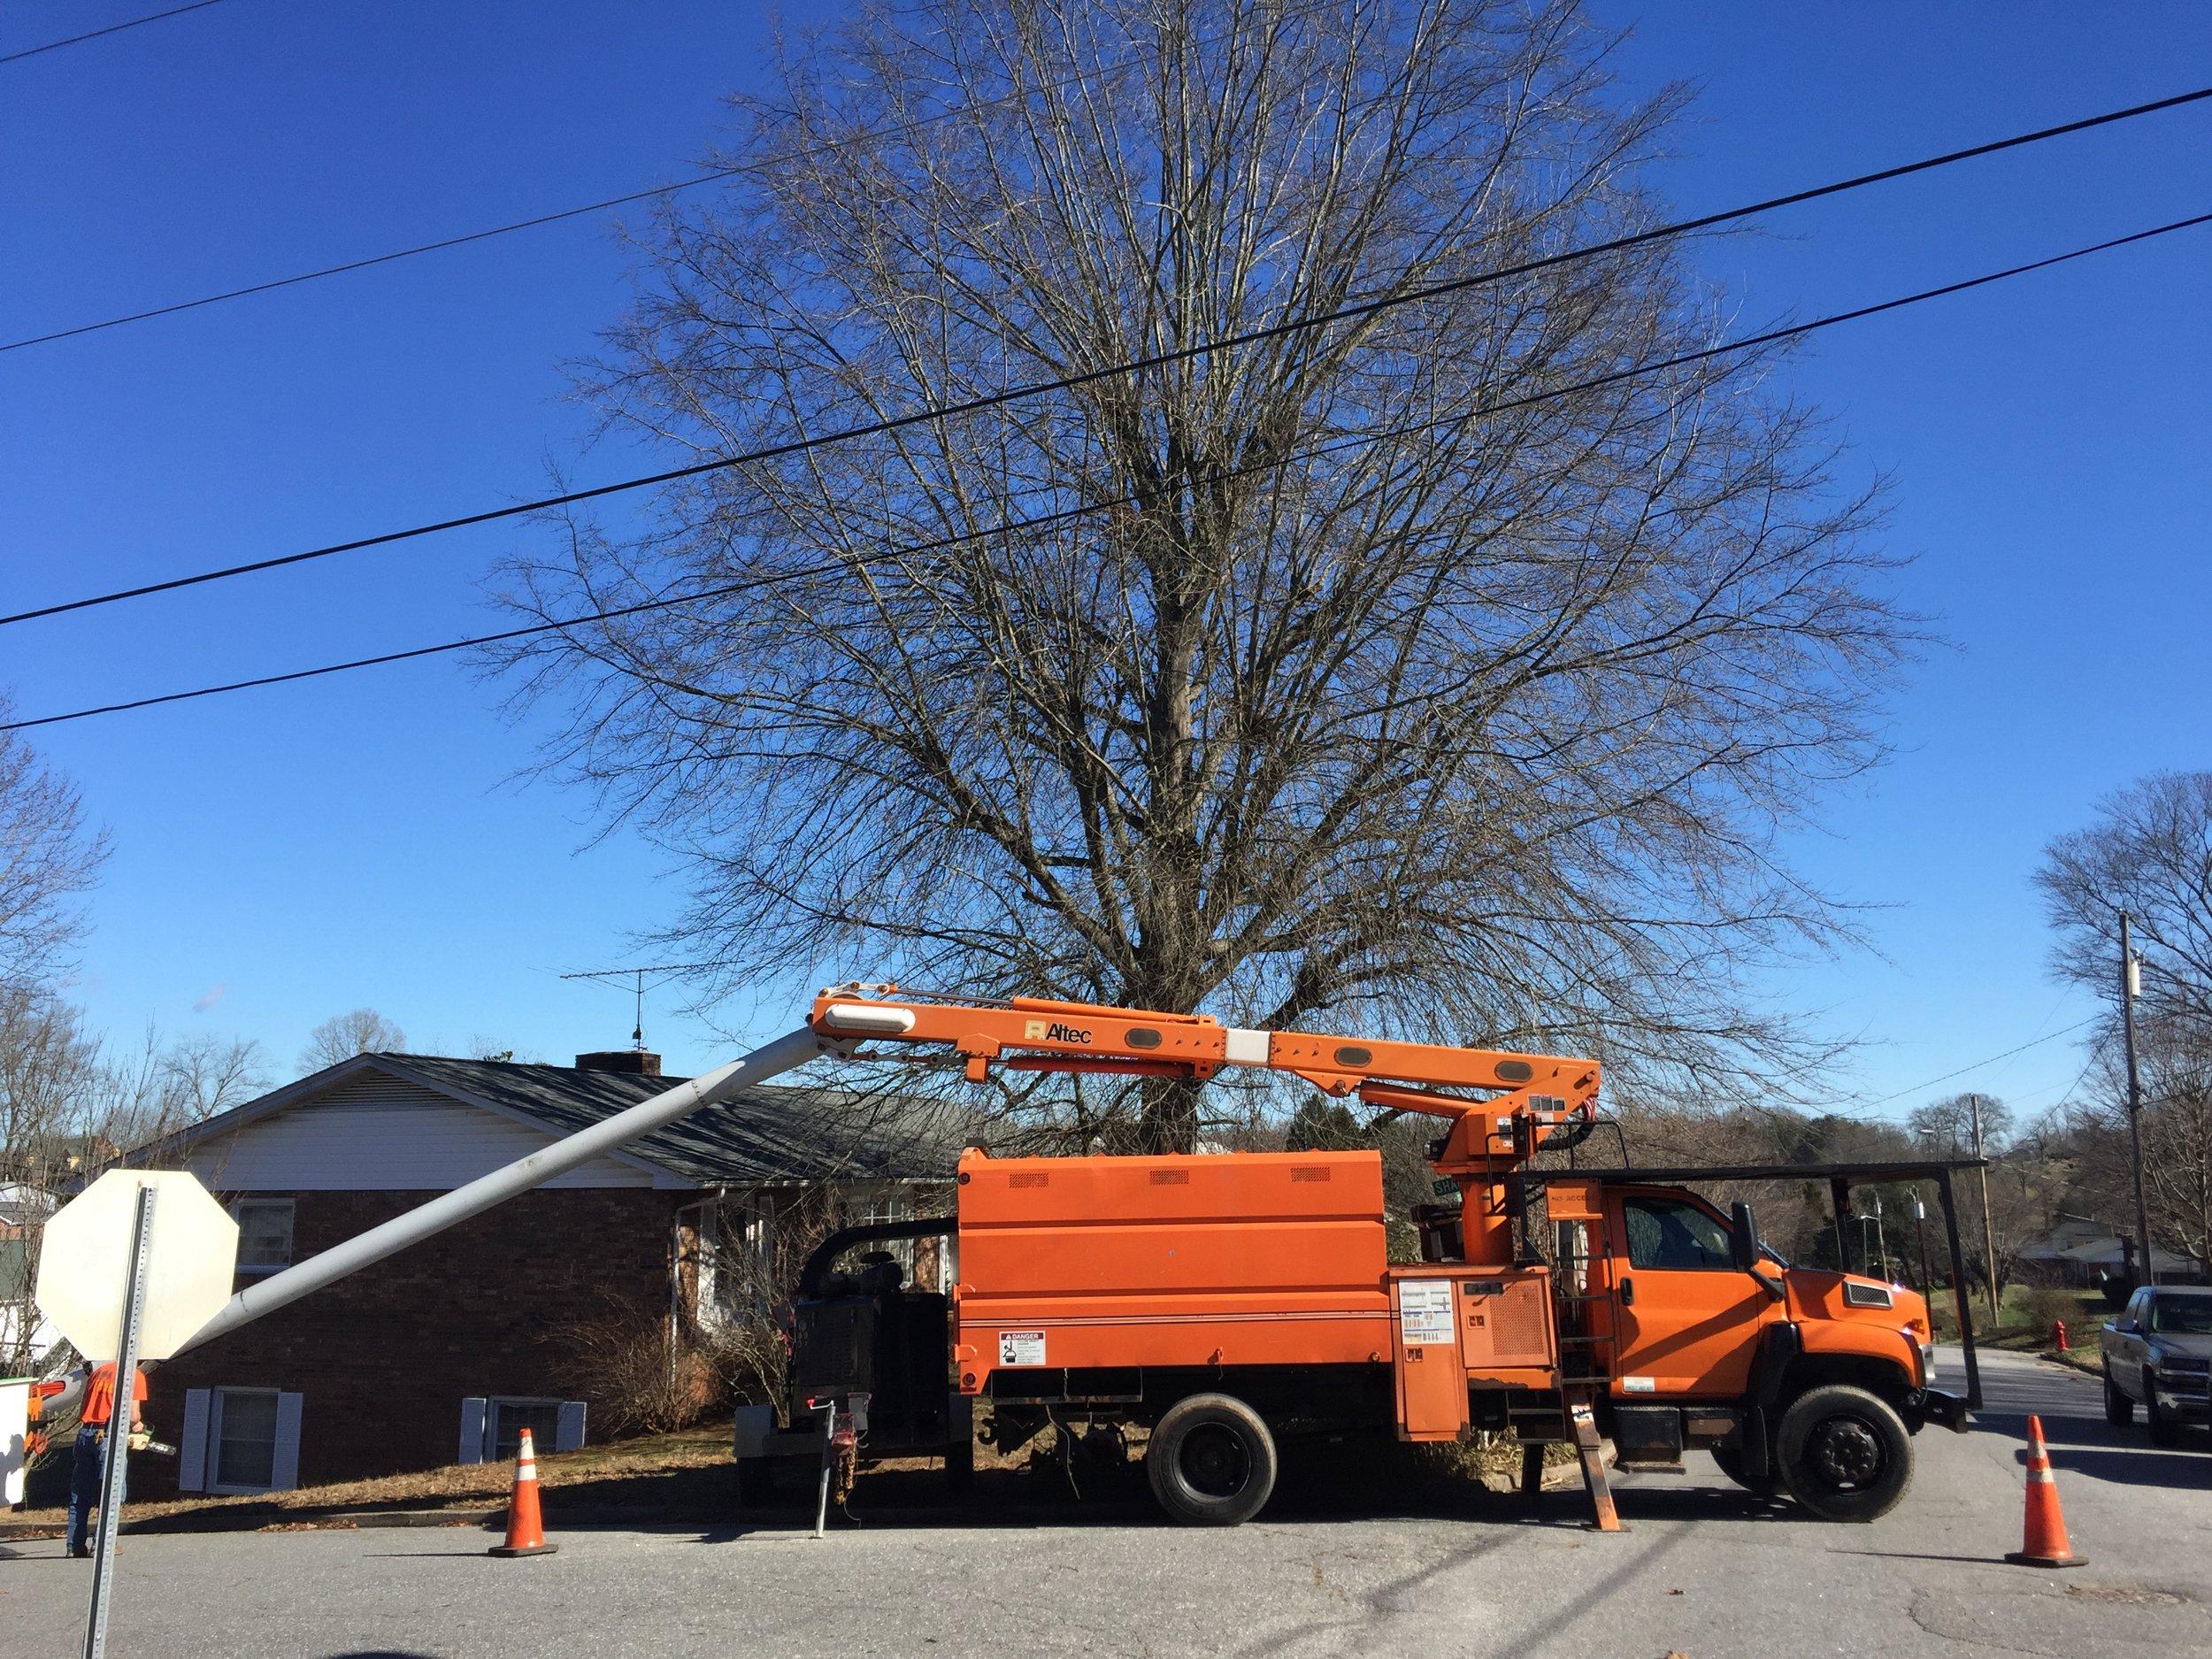 Limbwalkers Tree & Crane Service is a tree service company based in Morganton, North Carolina.